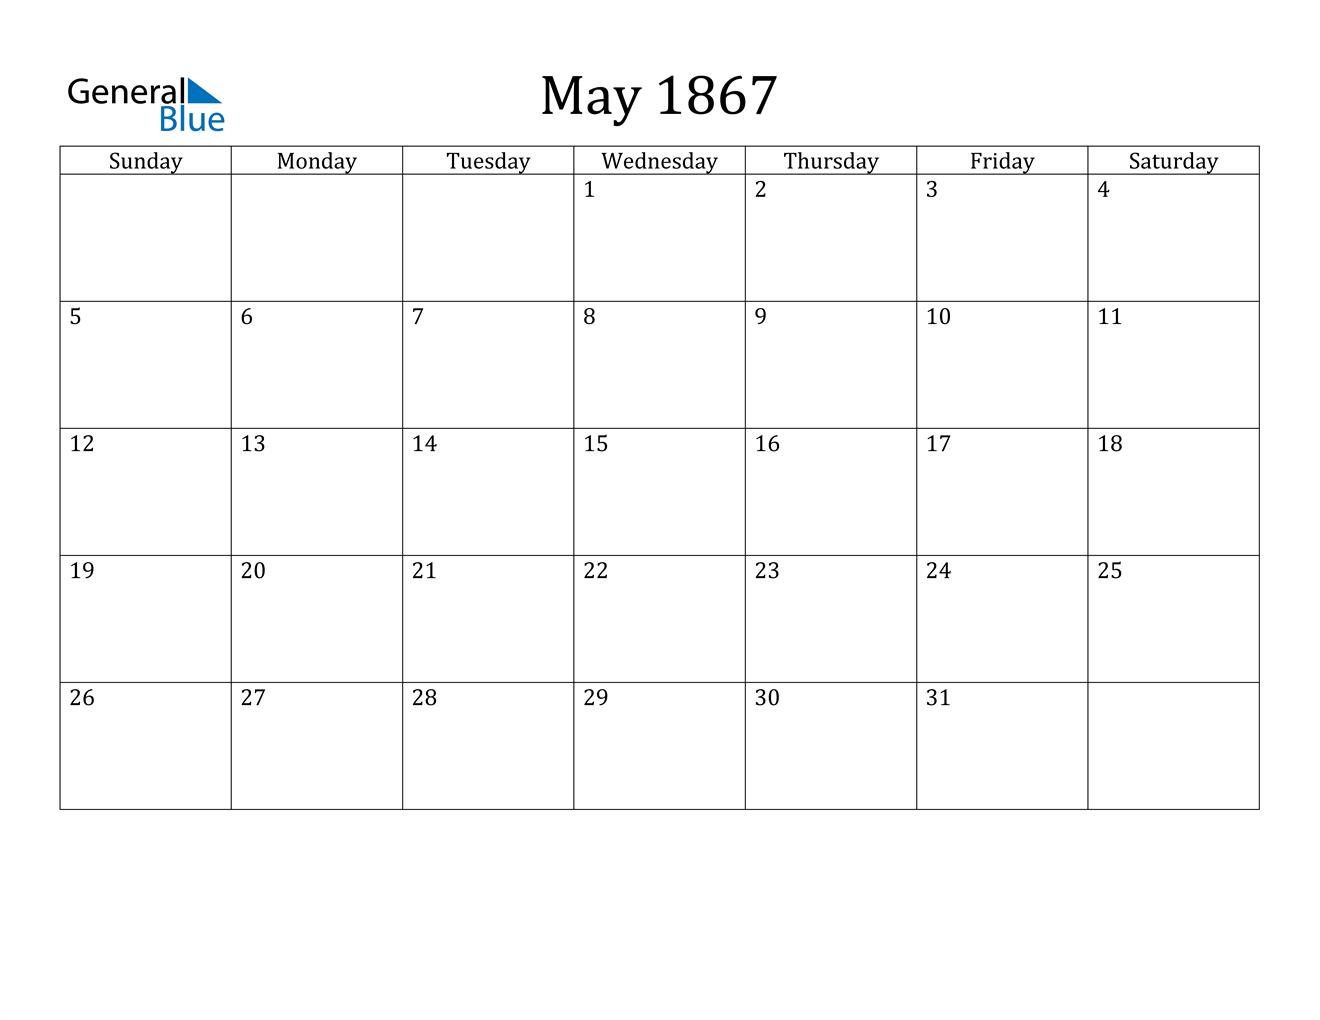 Image of May 1867 Calendar